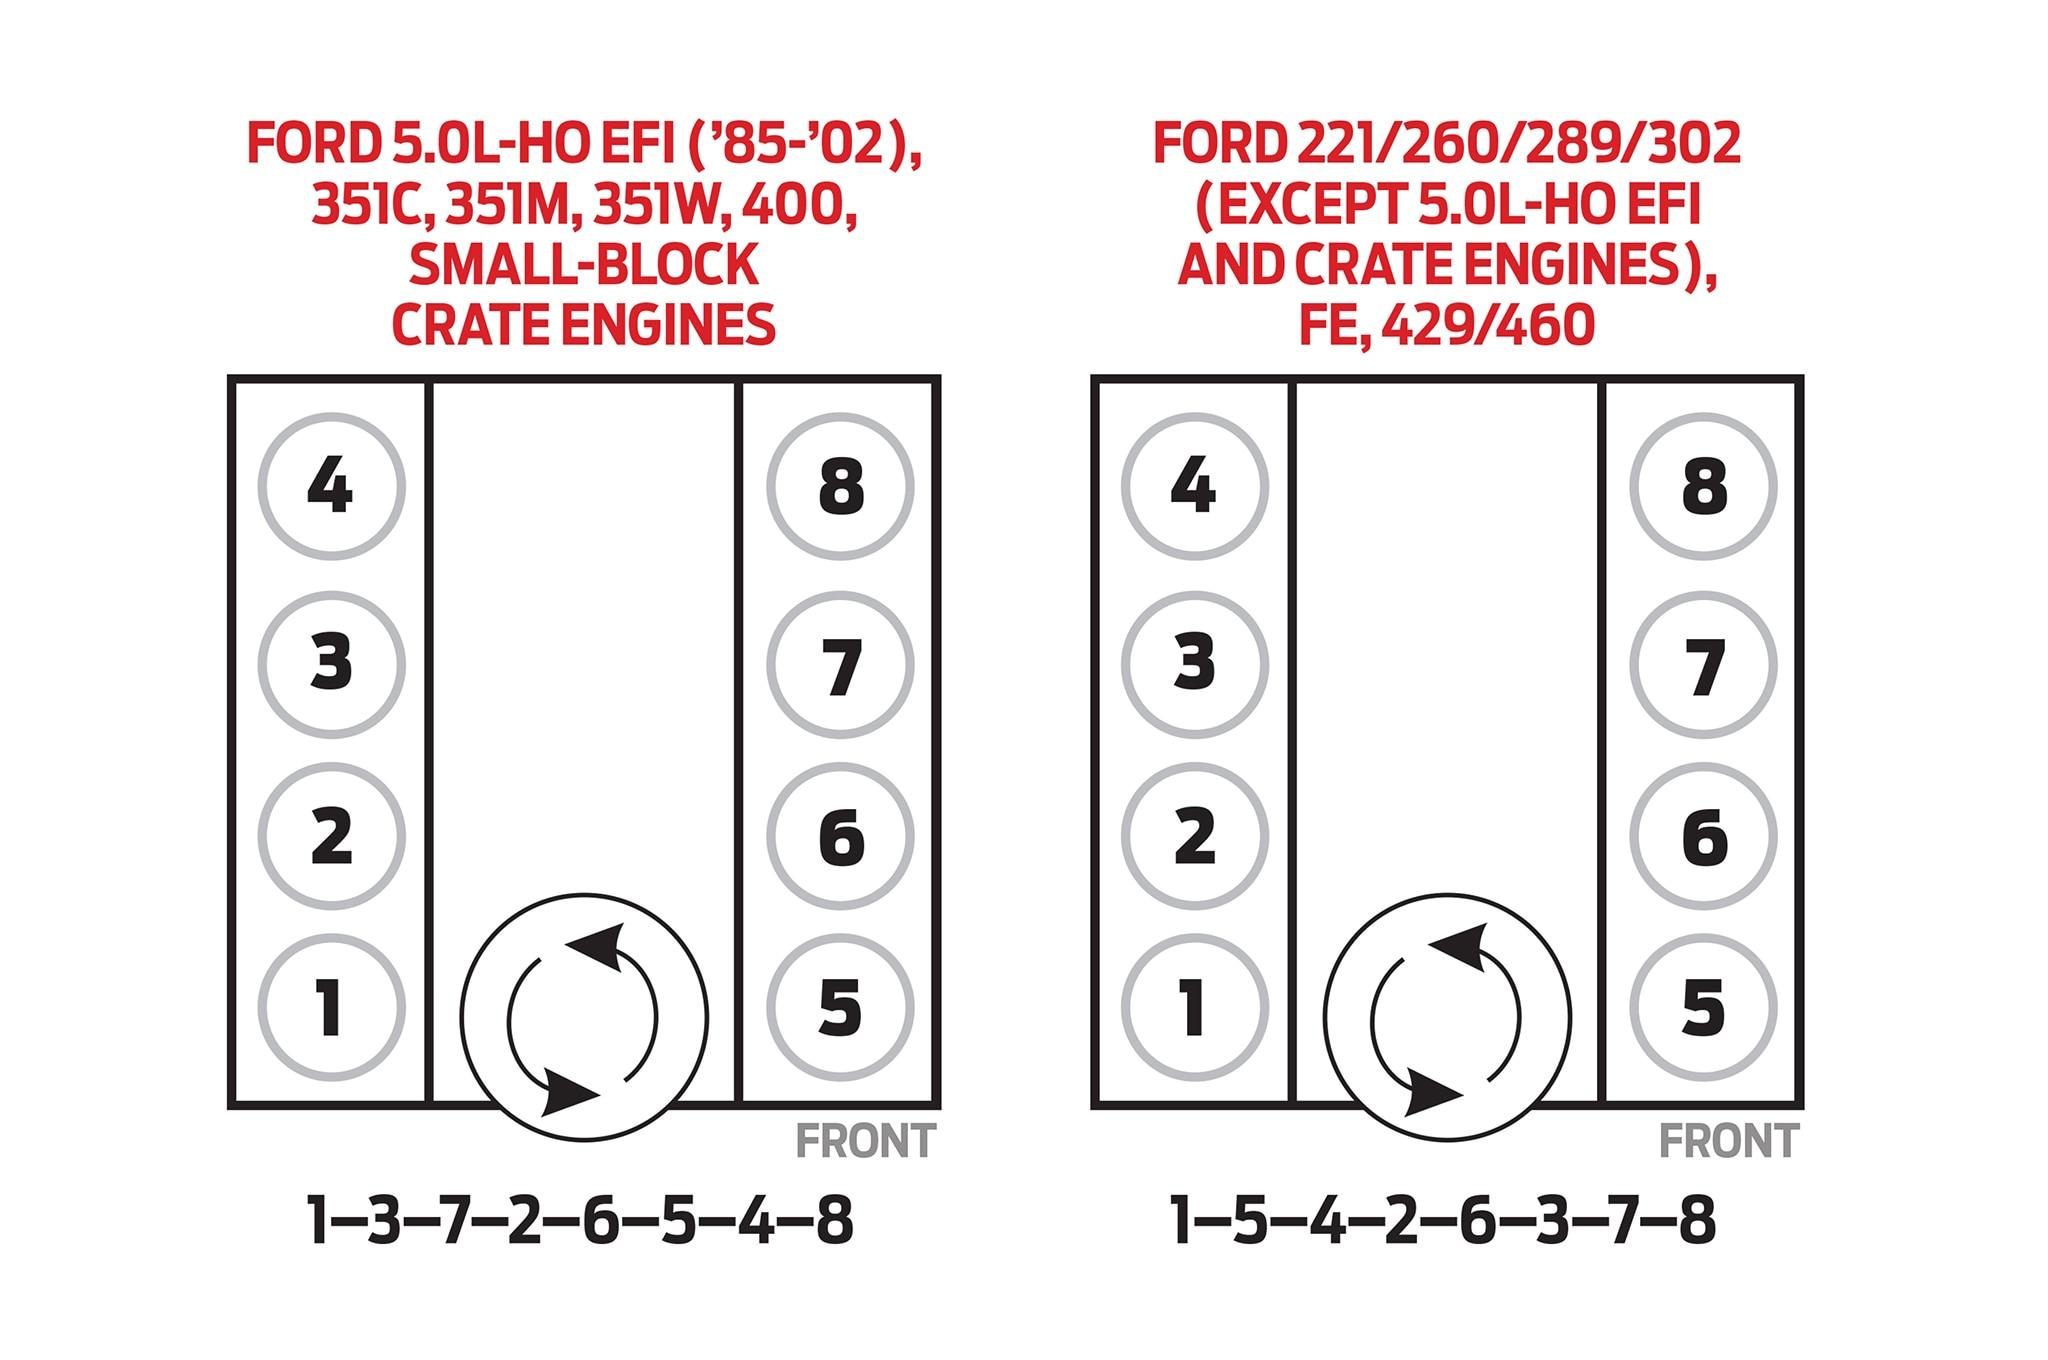 1986 Ford F150 5.0 Firing Order | Ford Firing Order